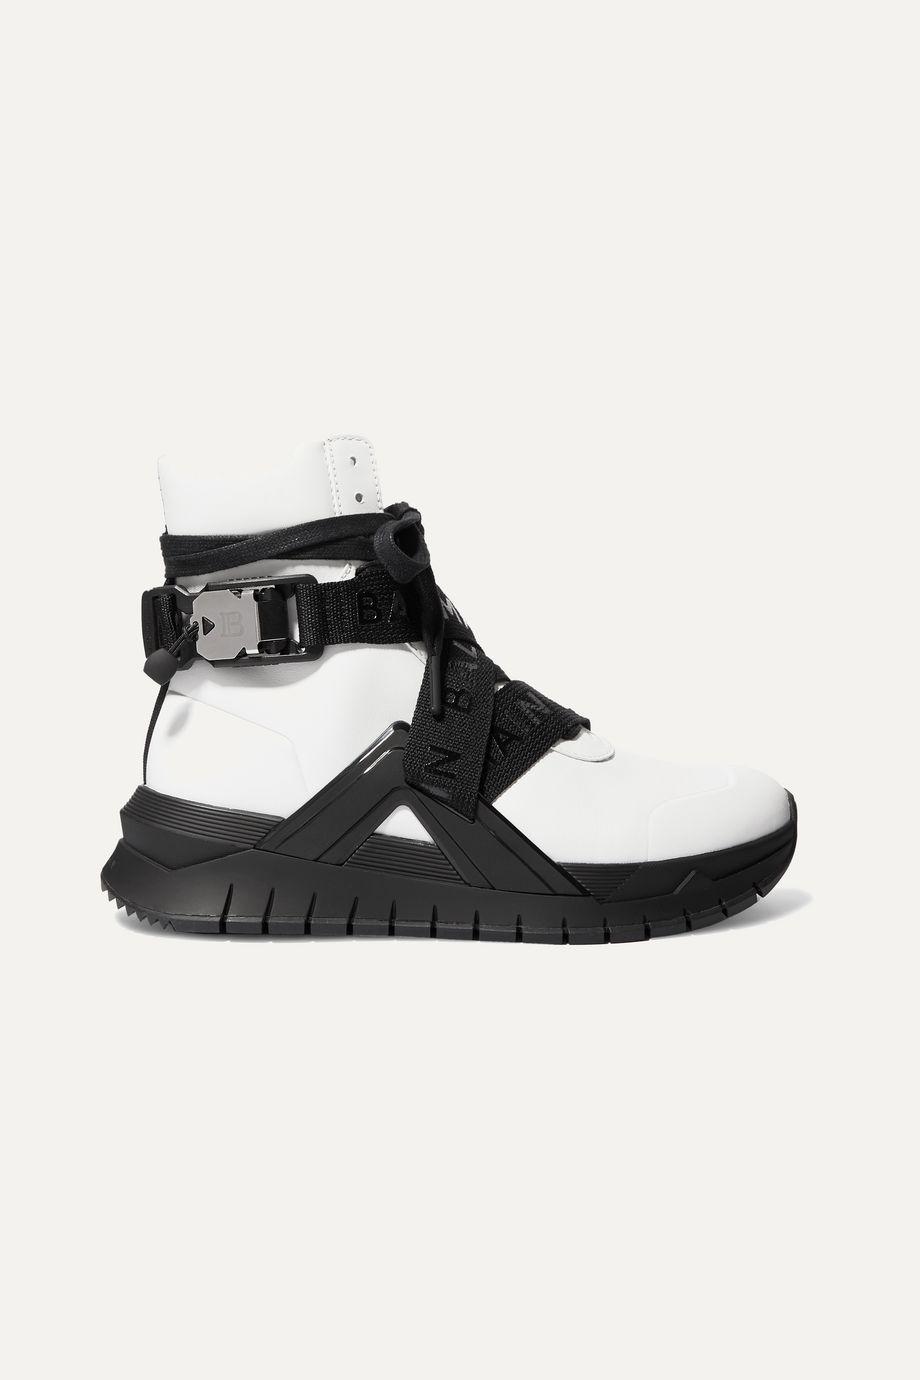 Balmain Troop 品牌标志印花弹力针织皮革高帮运动鞋